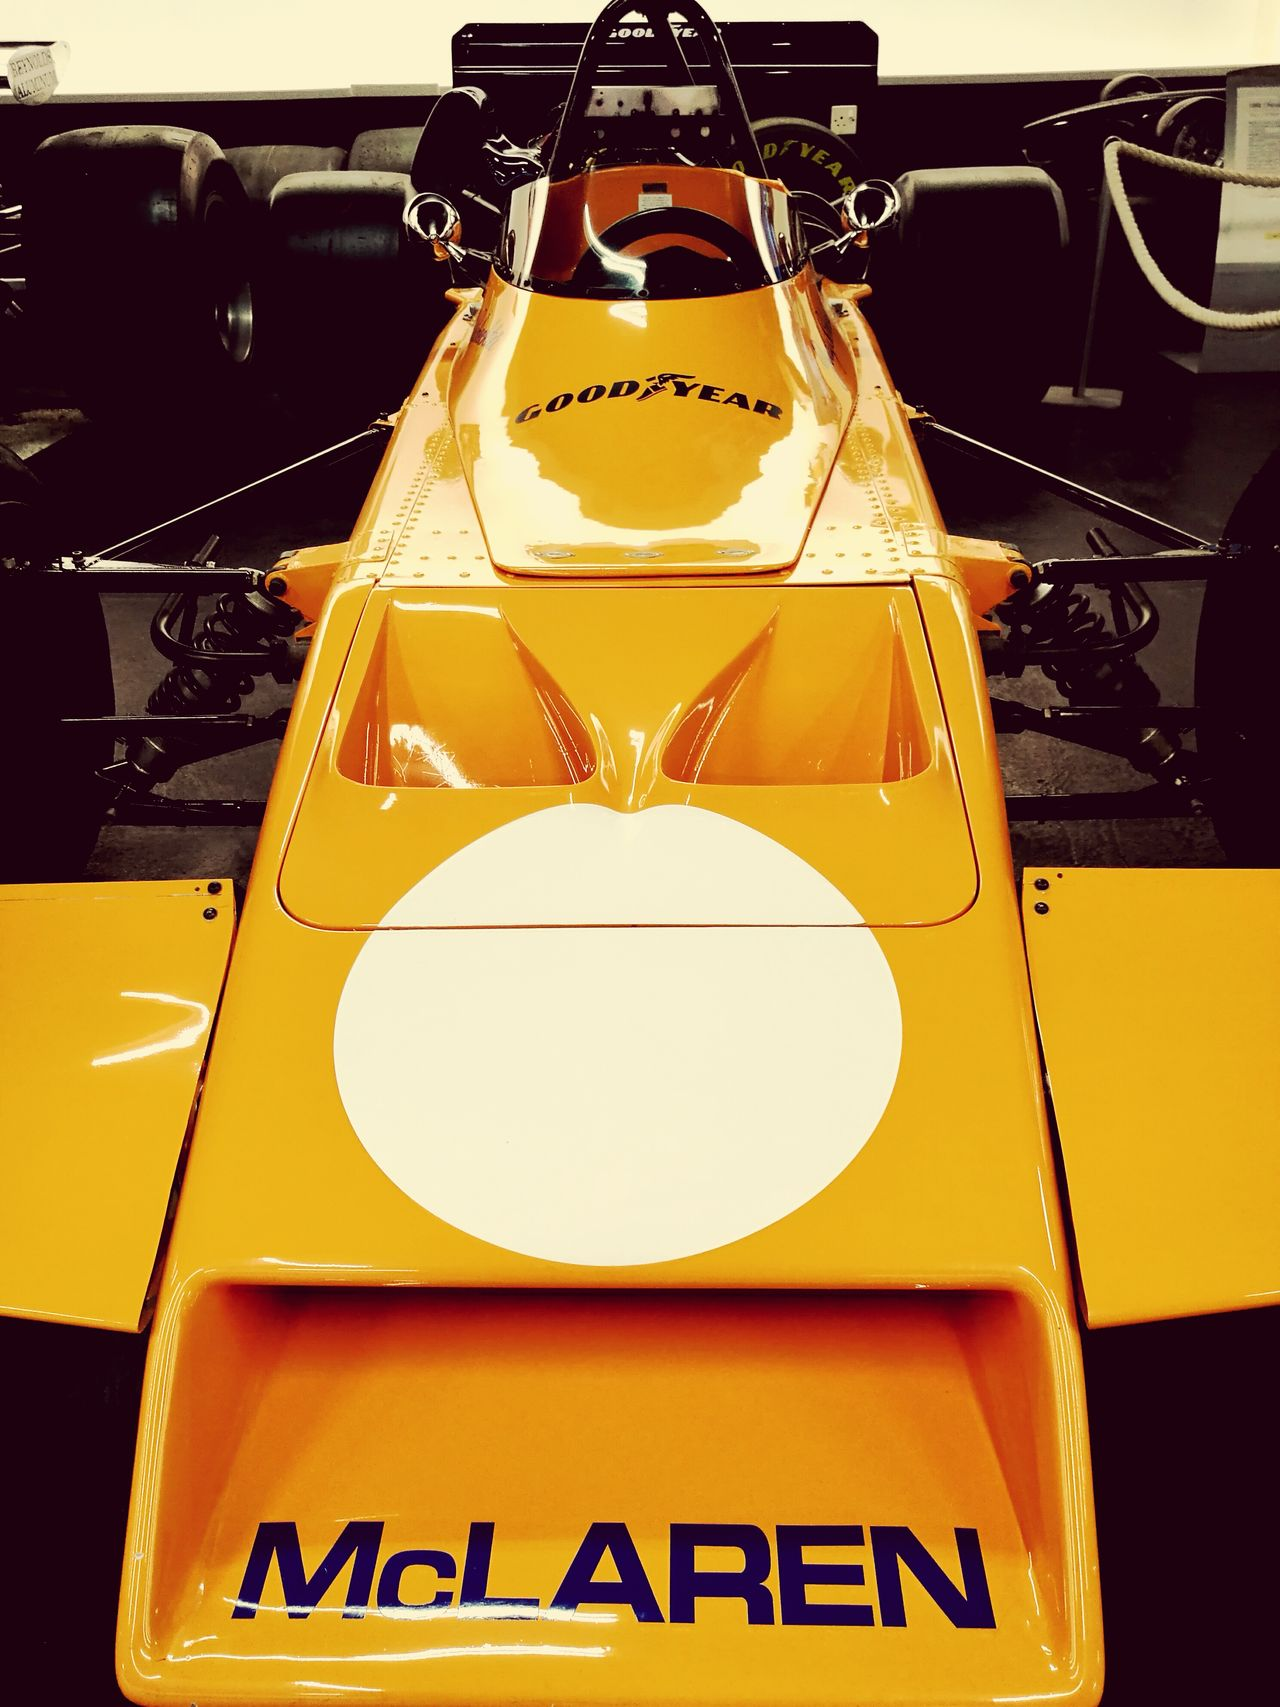 F1 Formula 1 McLaren Orangeandblue 43 Golden Moments The Color Of Sport